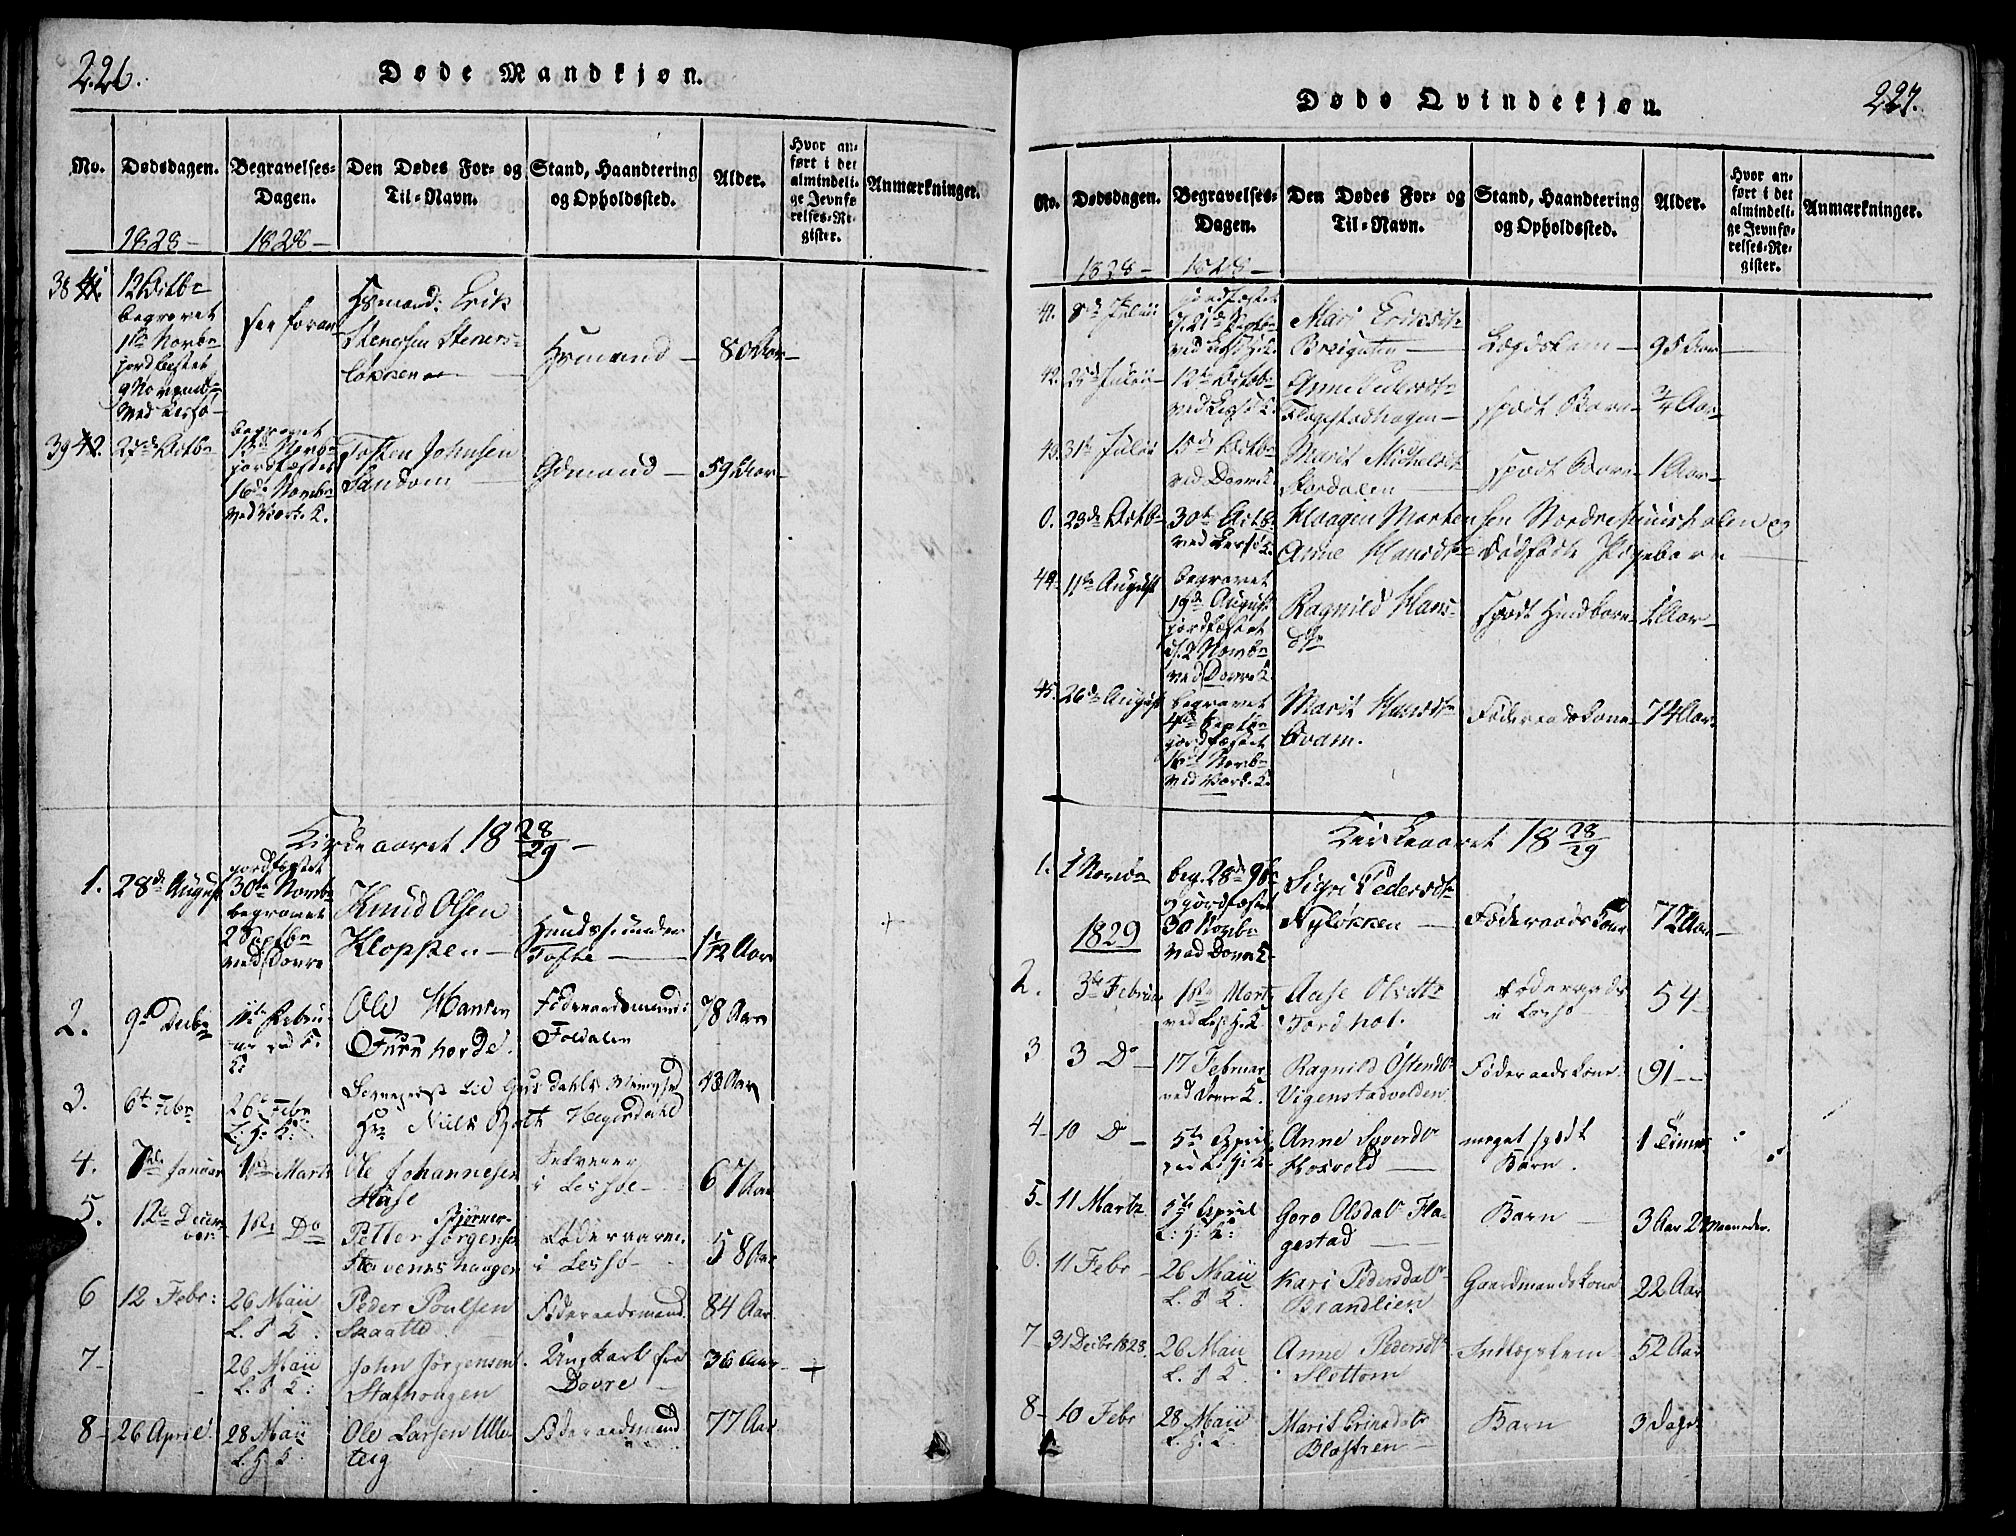 SAH, Lesja prestekontor, Ministerialbok nr. 4, 1820-1829, s. 226-227